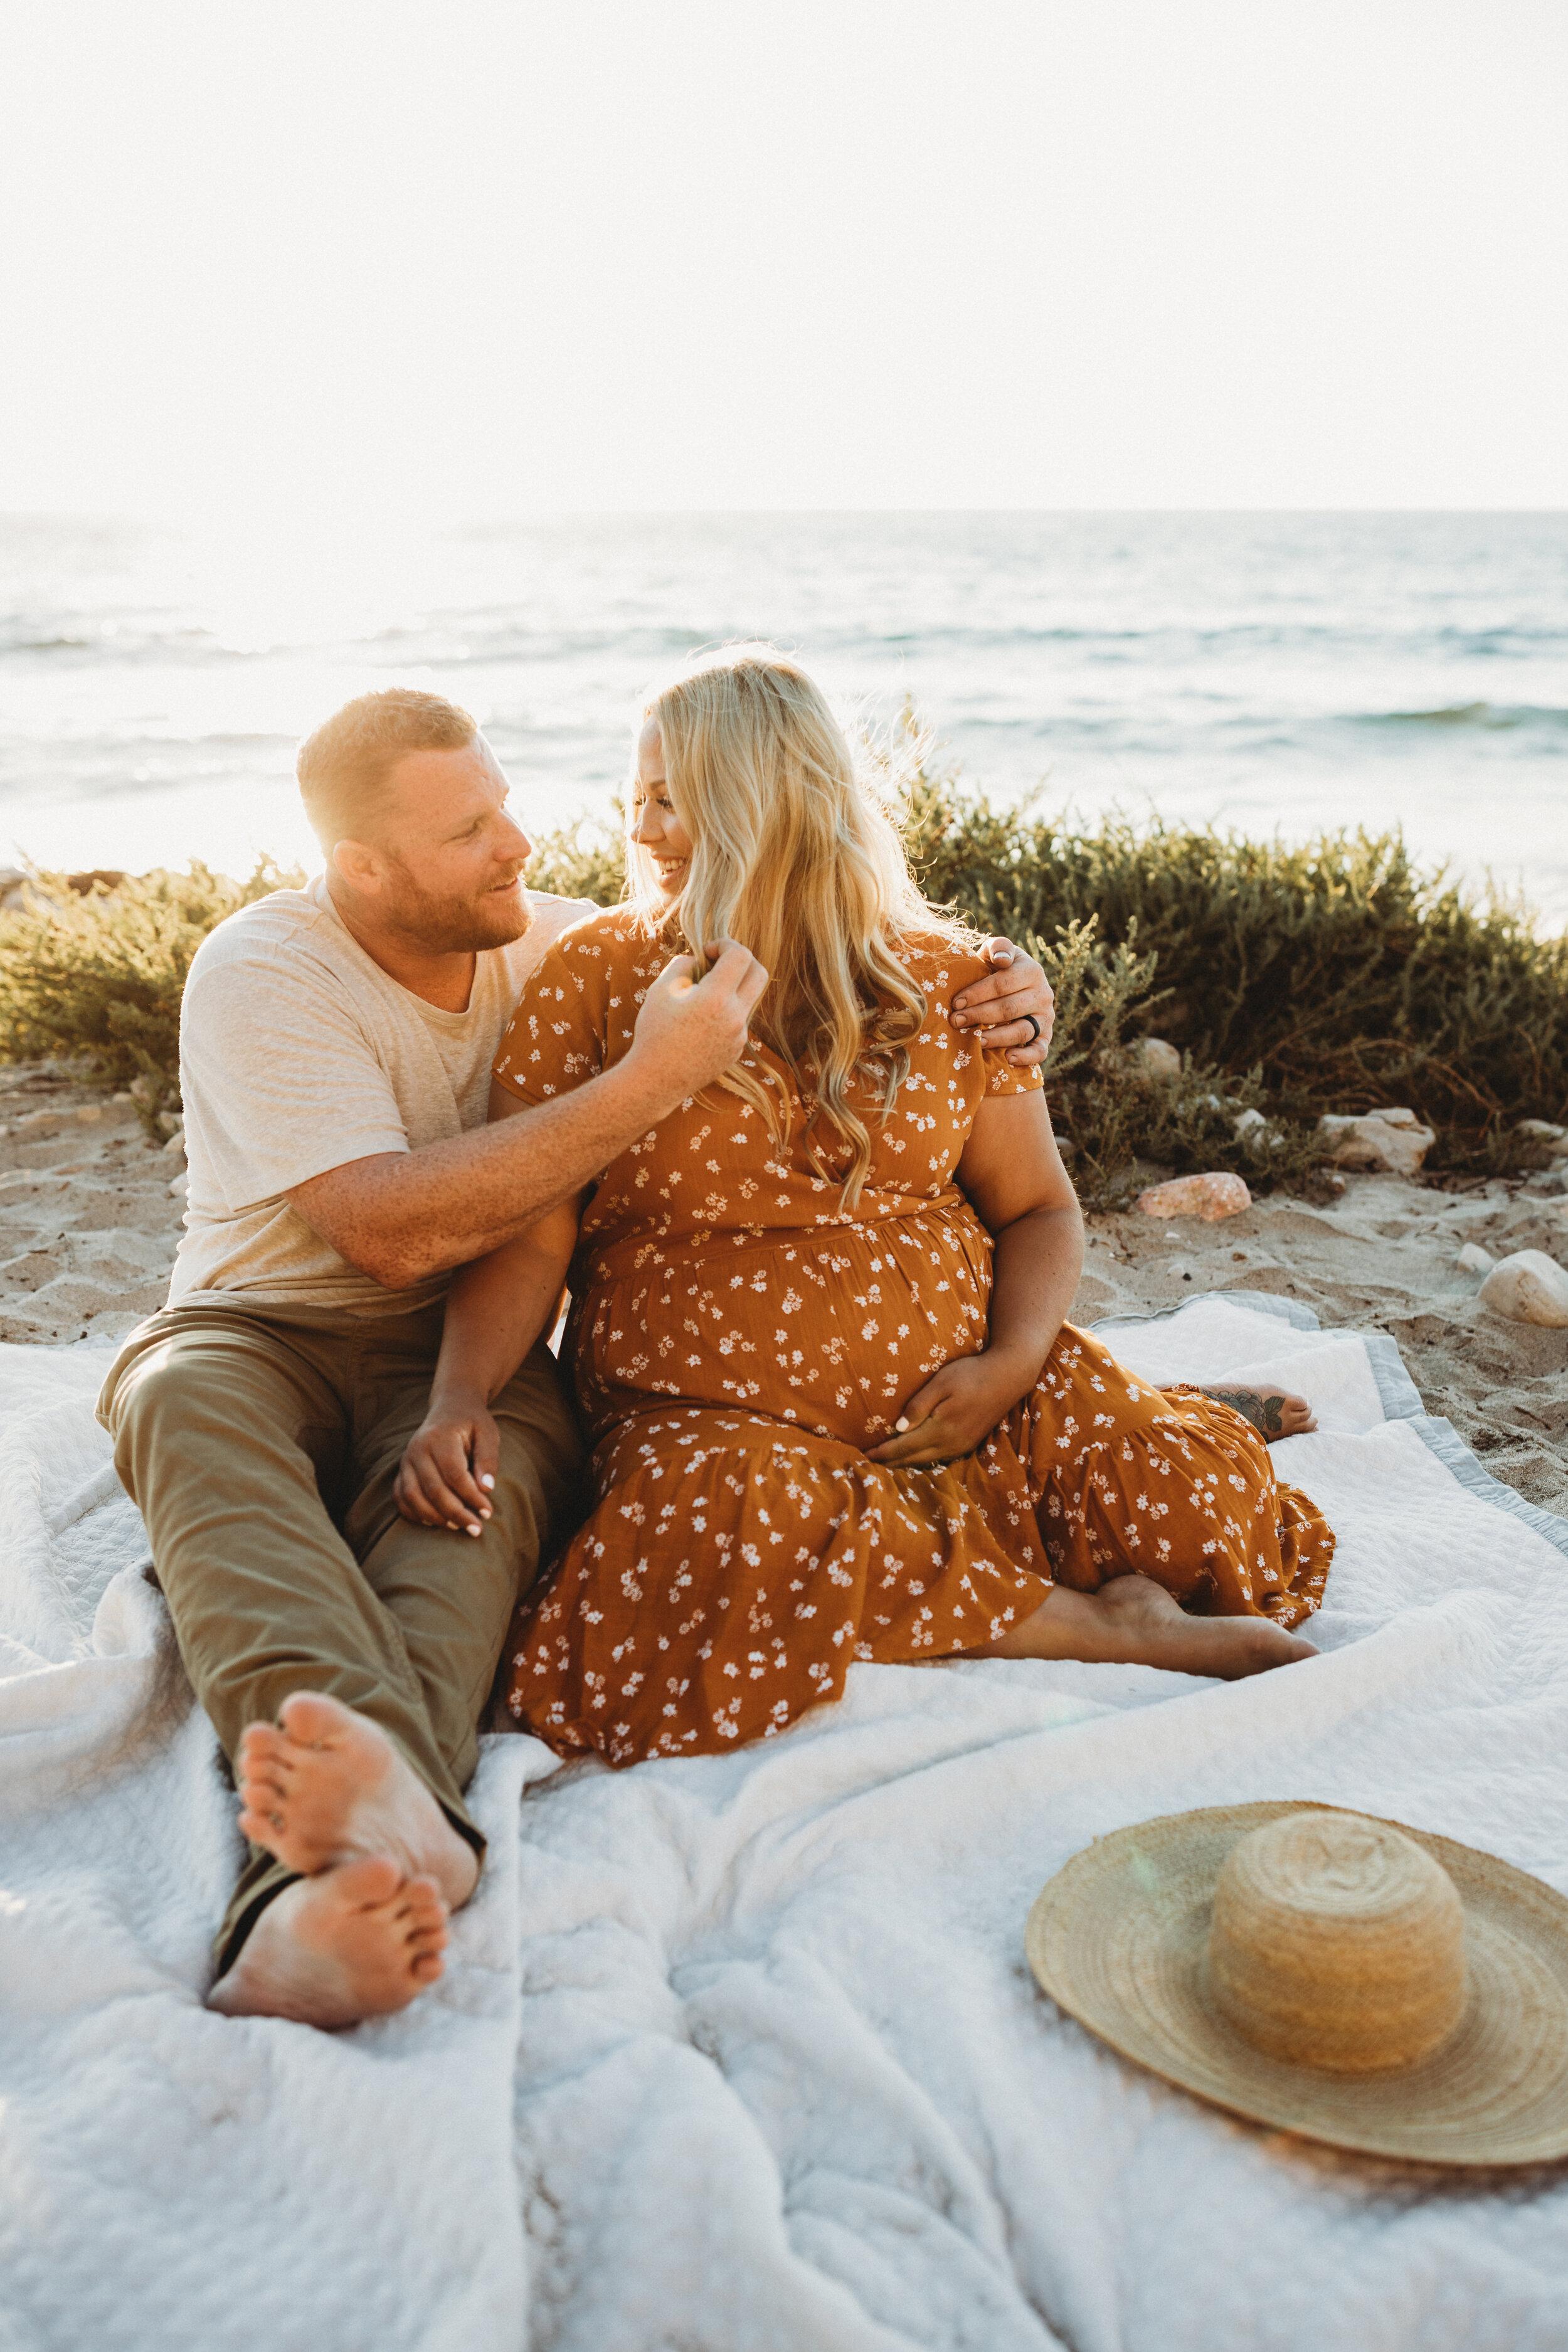 kissing on beach - Lindsay Petty Photography